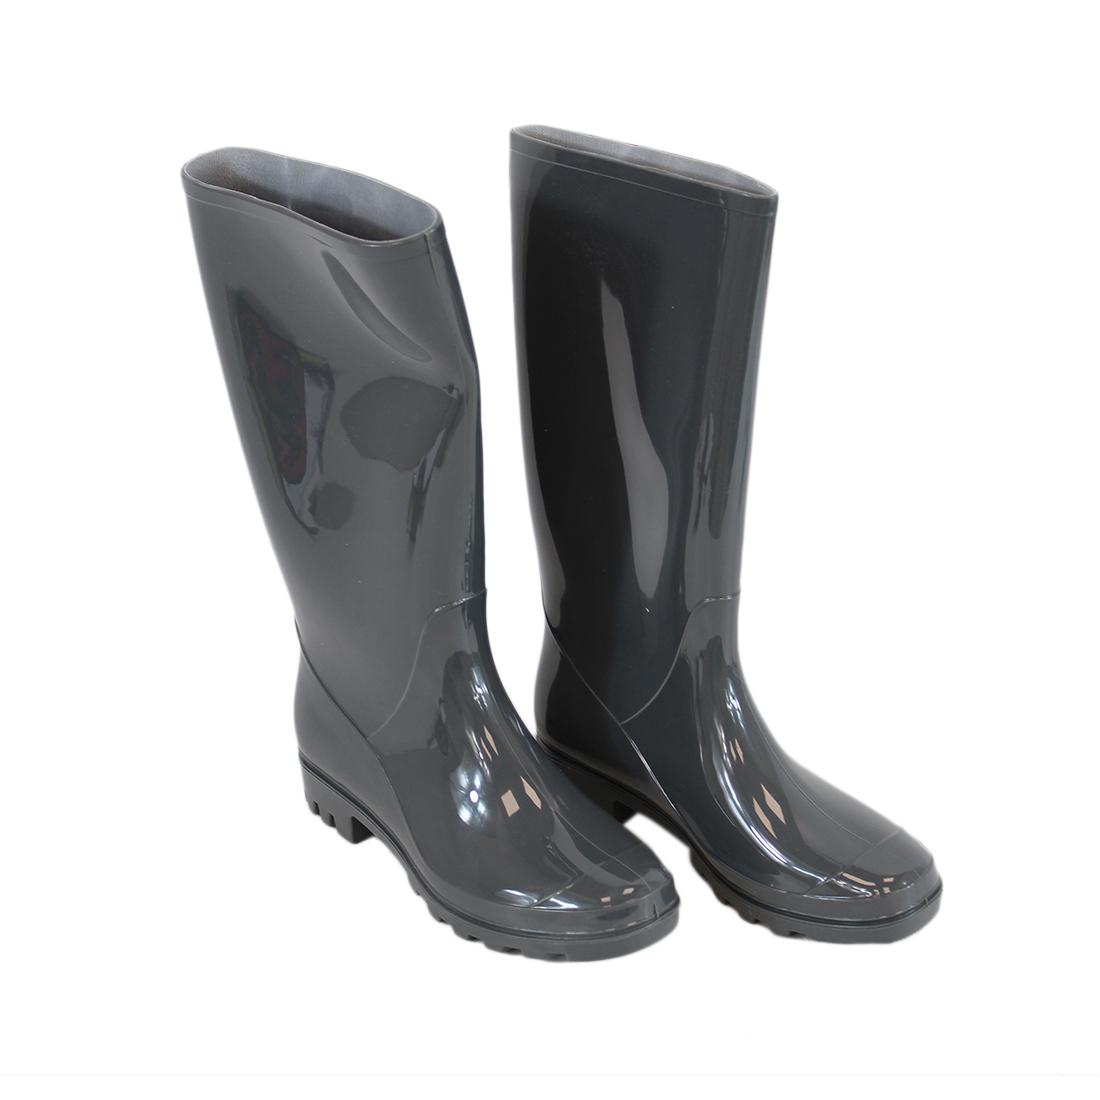 Tall glossy wellington boots